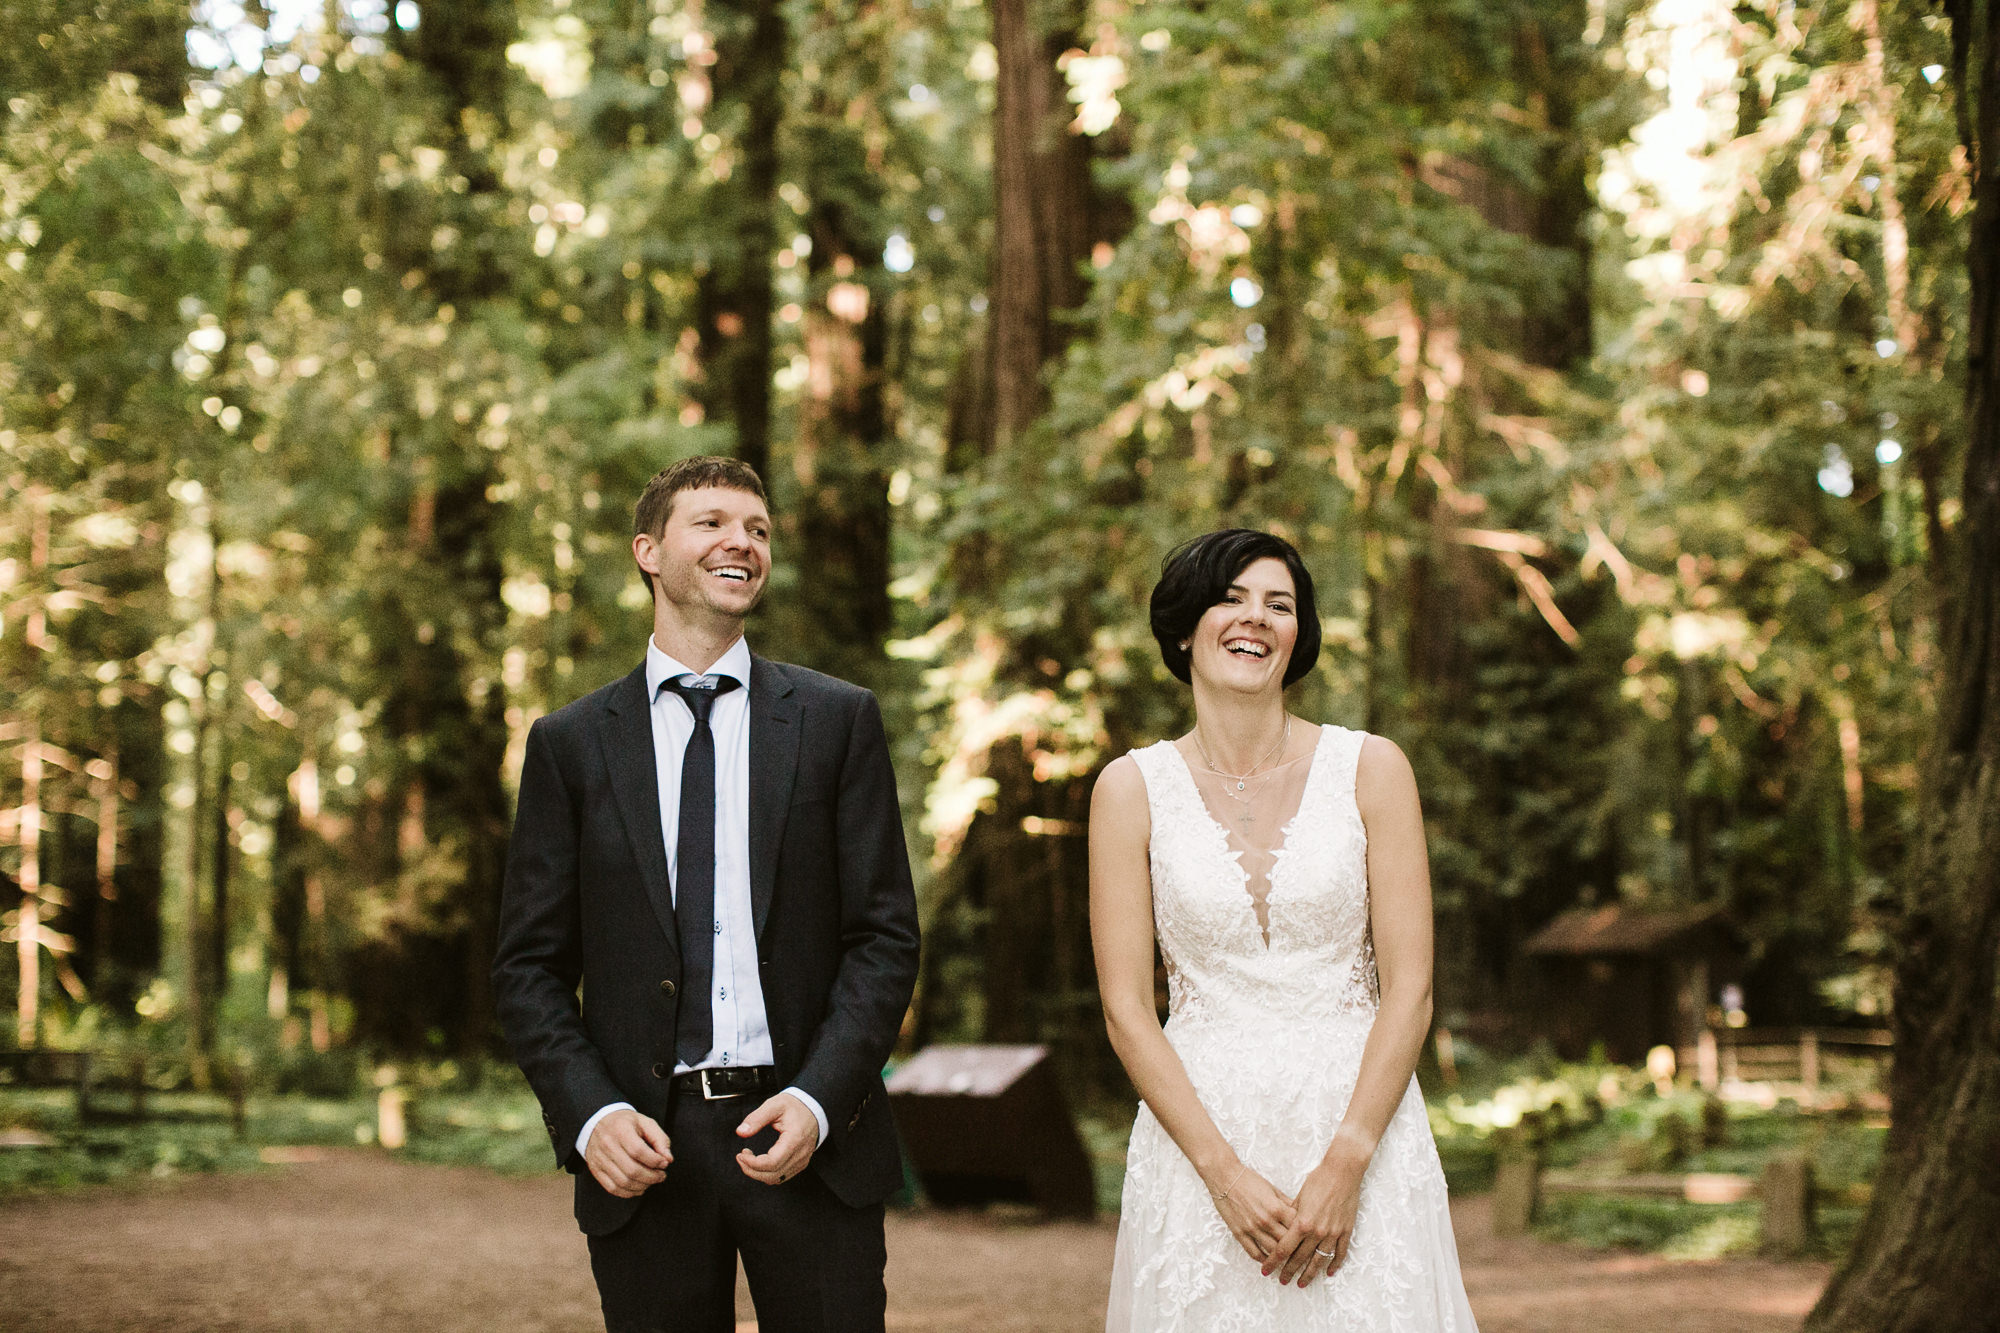 California-wedding-photographer-alfonso-flores-pamplin-groove-310.jpg